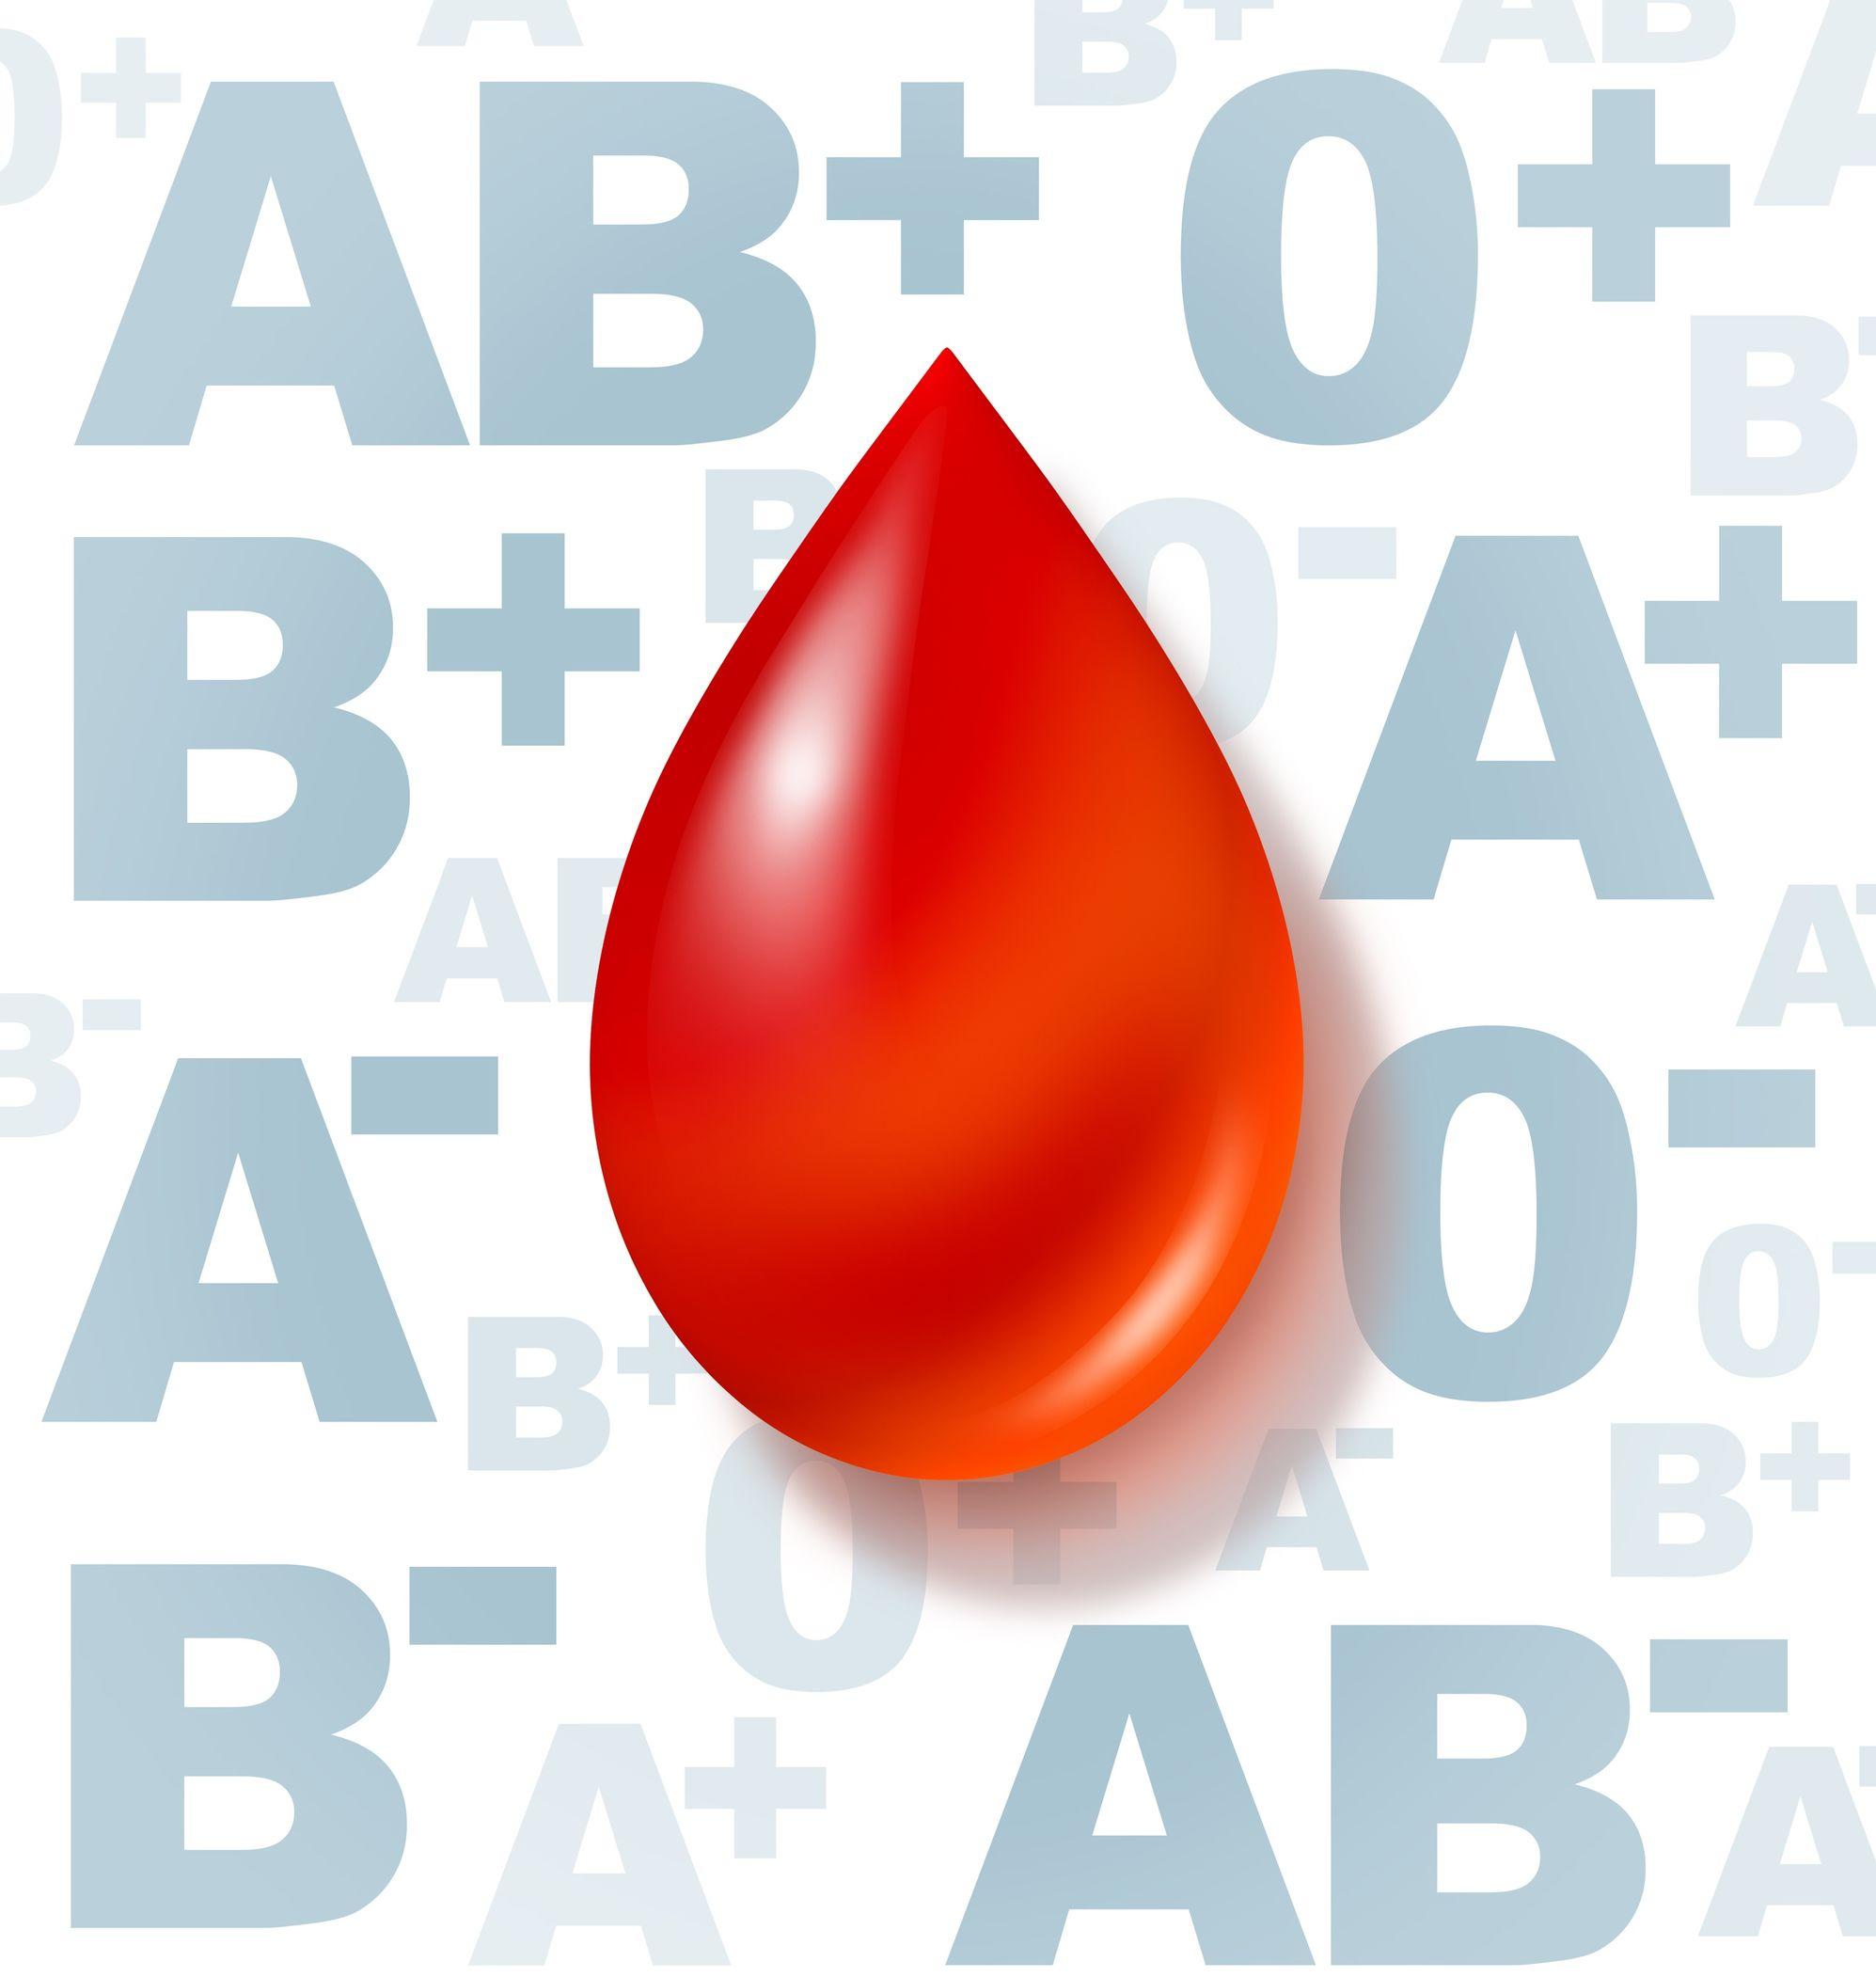 Verschiedene Blutgruppen